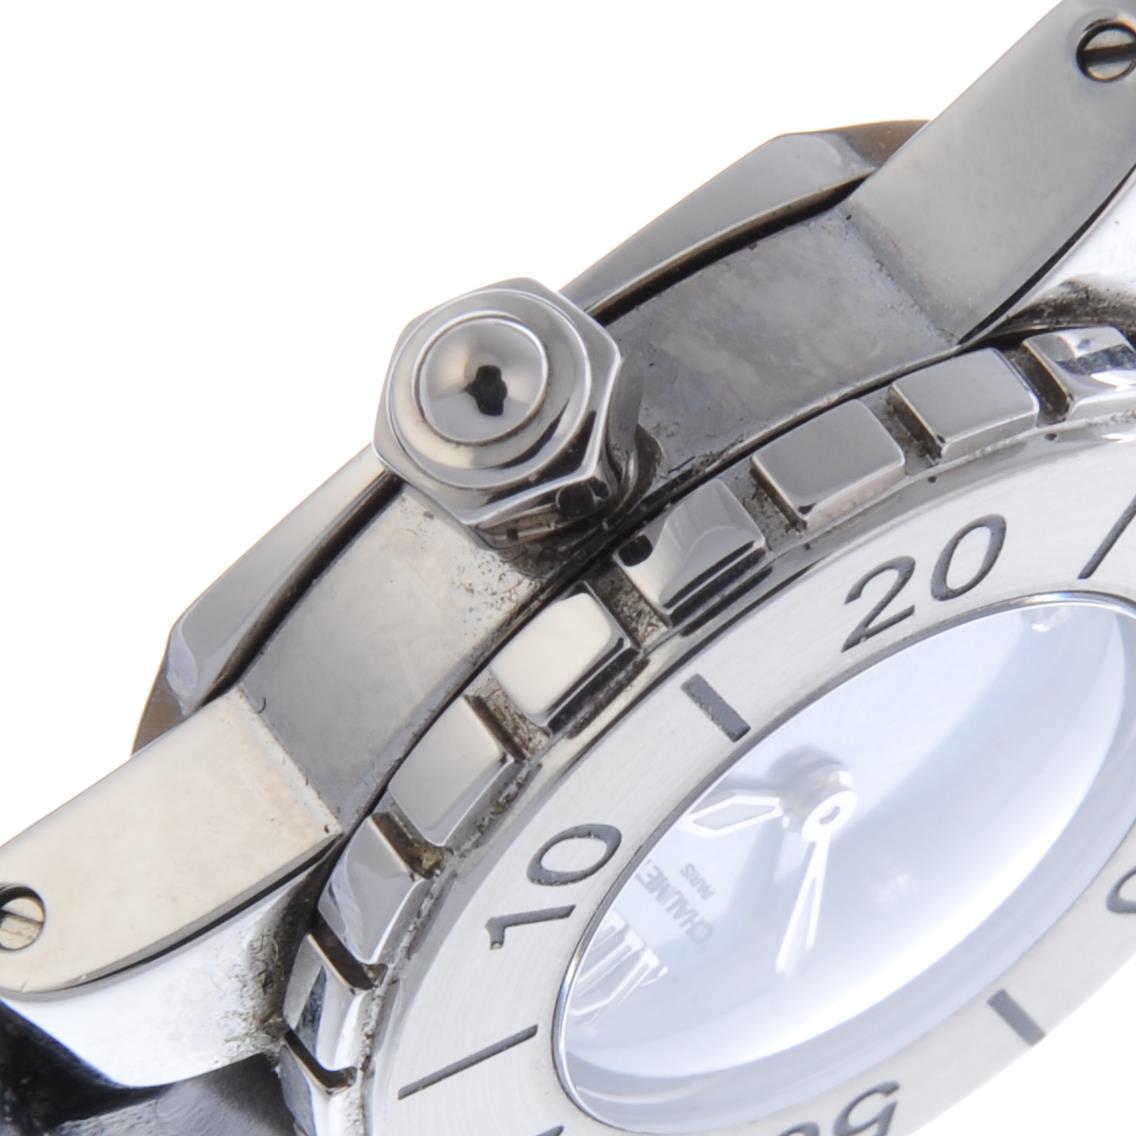 Lot 15 - CHAUMET - a lady's Class One wrist watch.